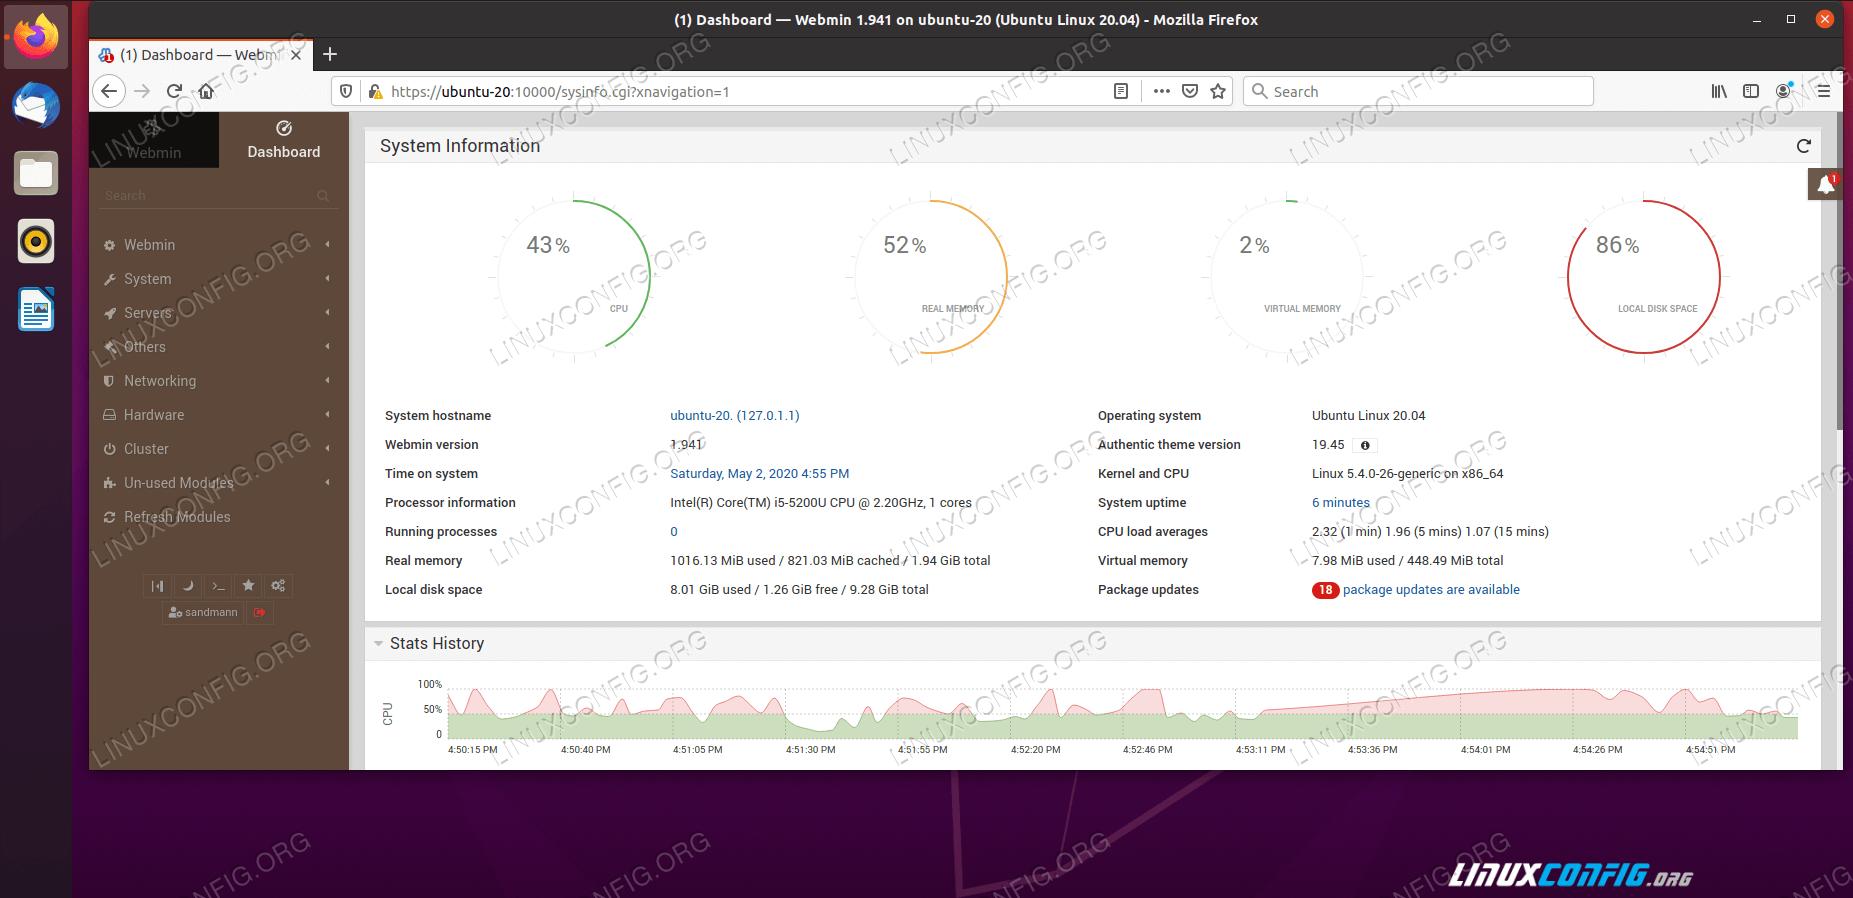 Webmin Dashboard on Ubuntu 20.04